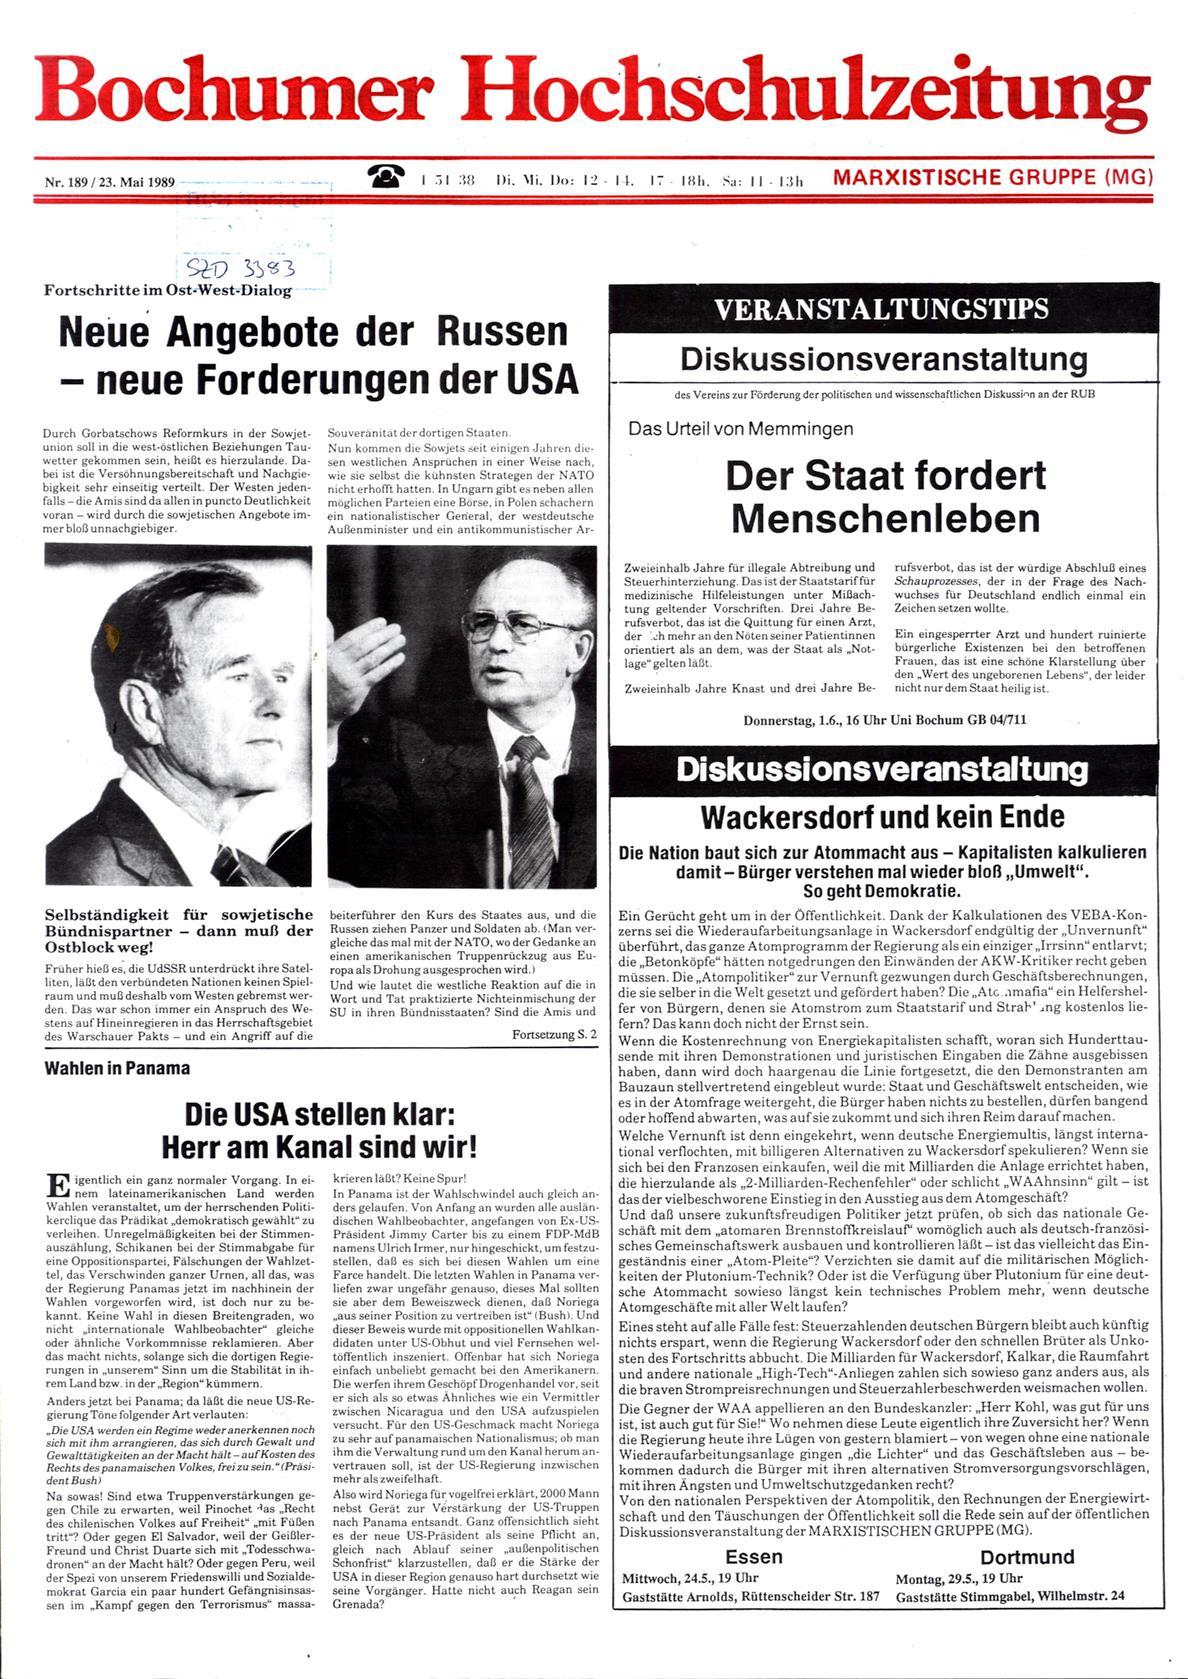 Bochum_BHZ_19890523_189_001